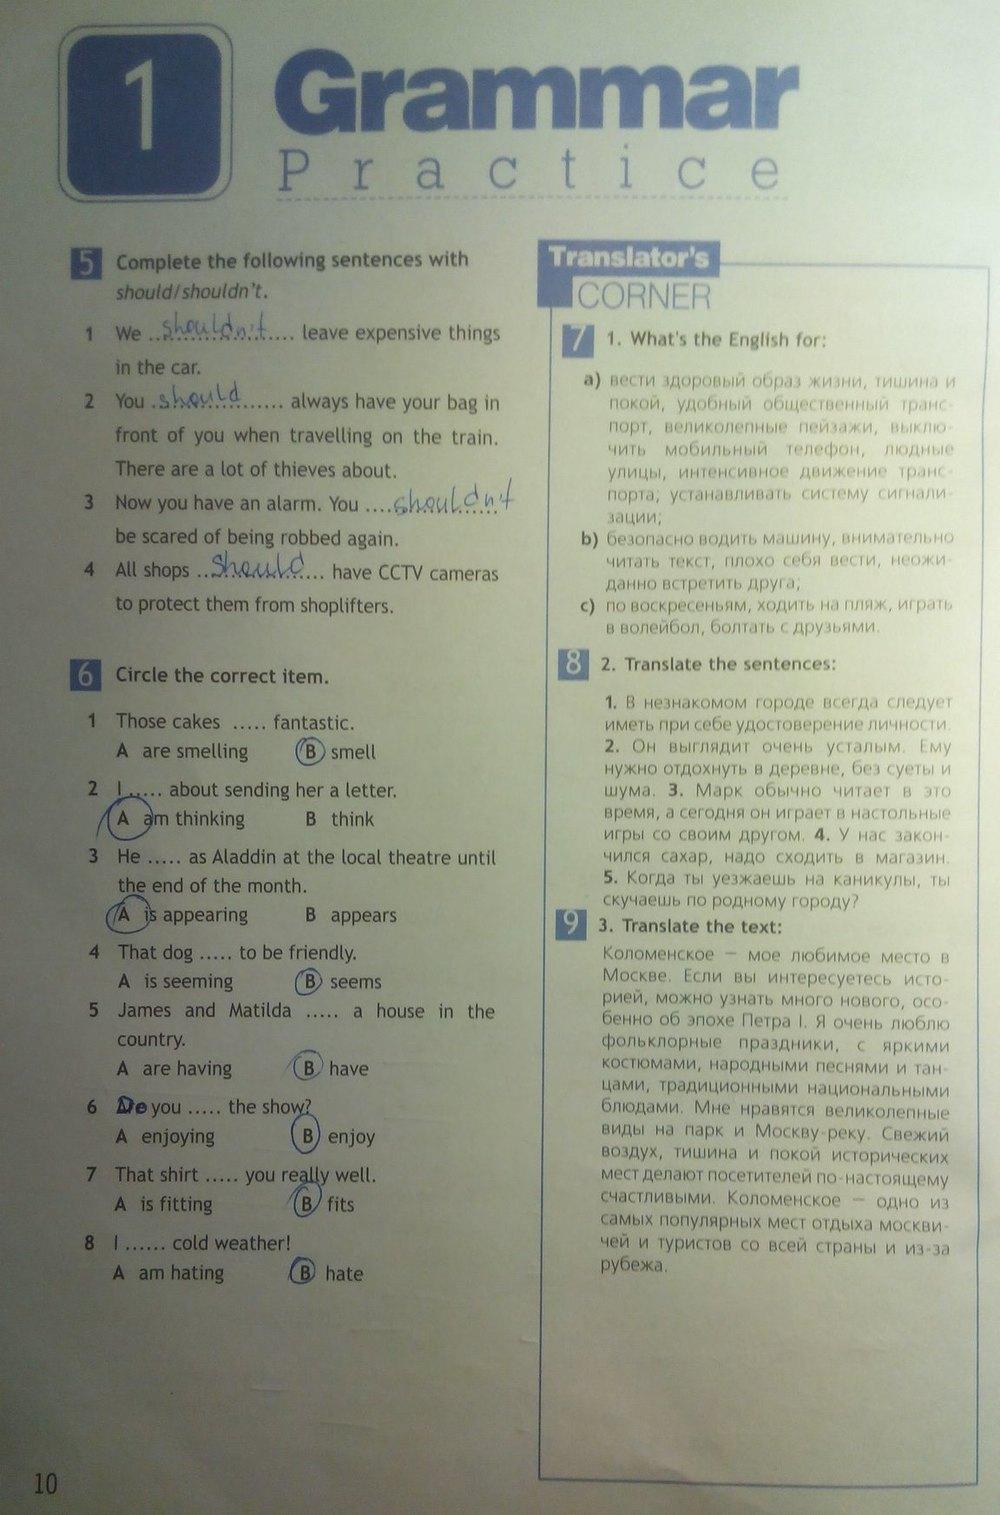 решебник к тетради по английскому 7 класс ваулина